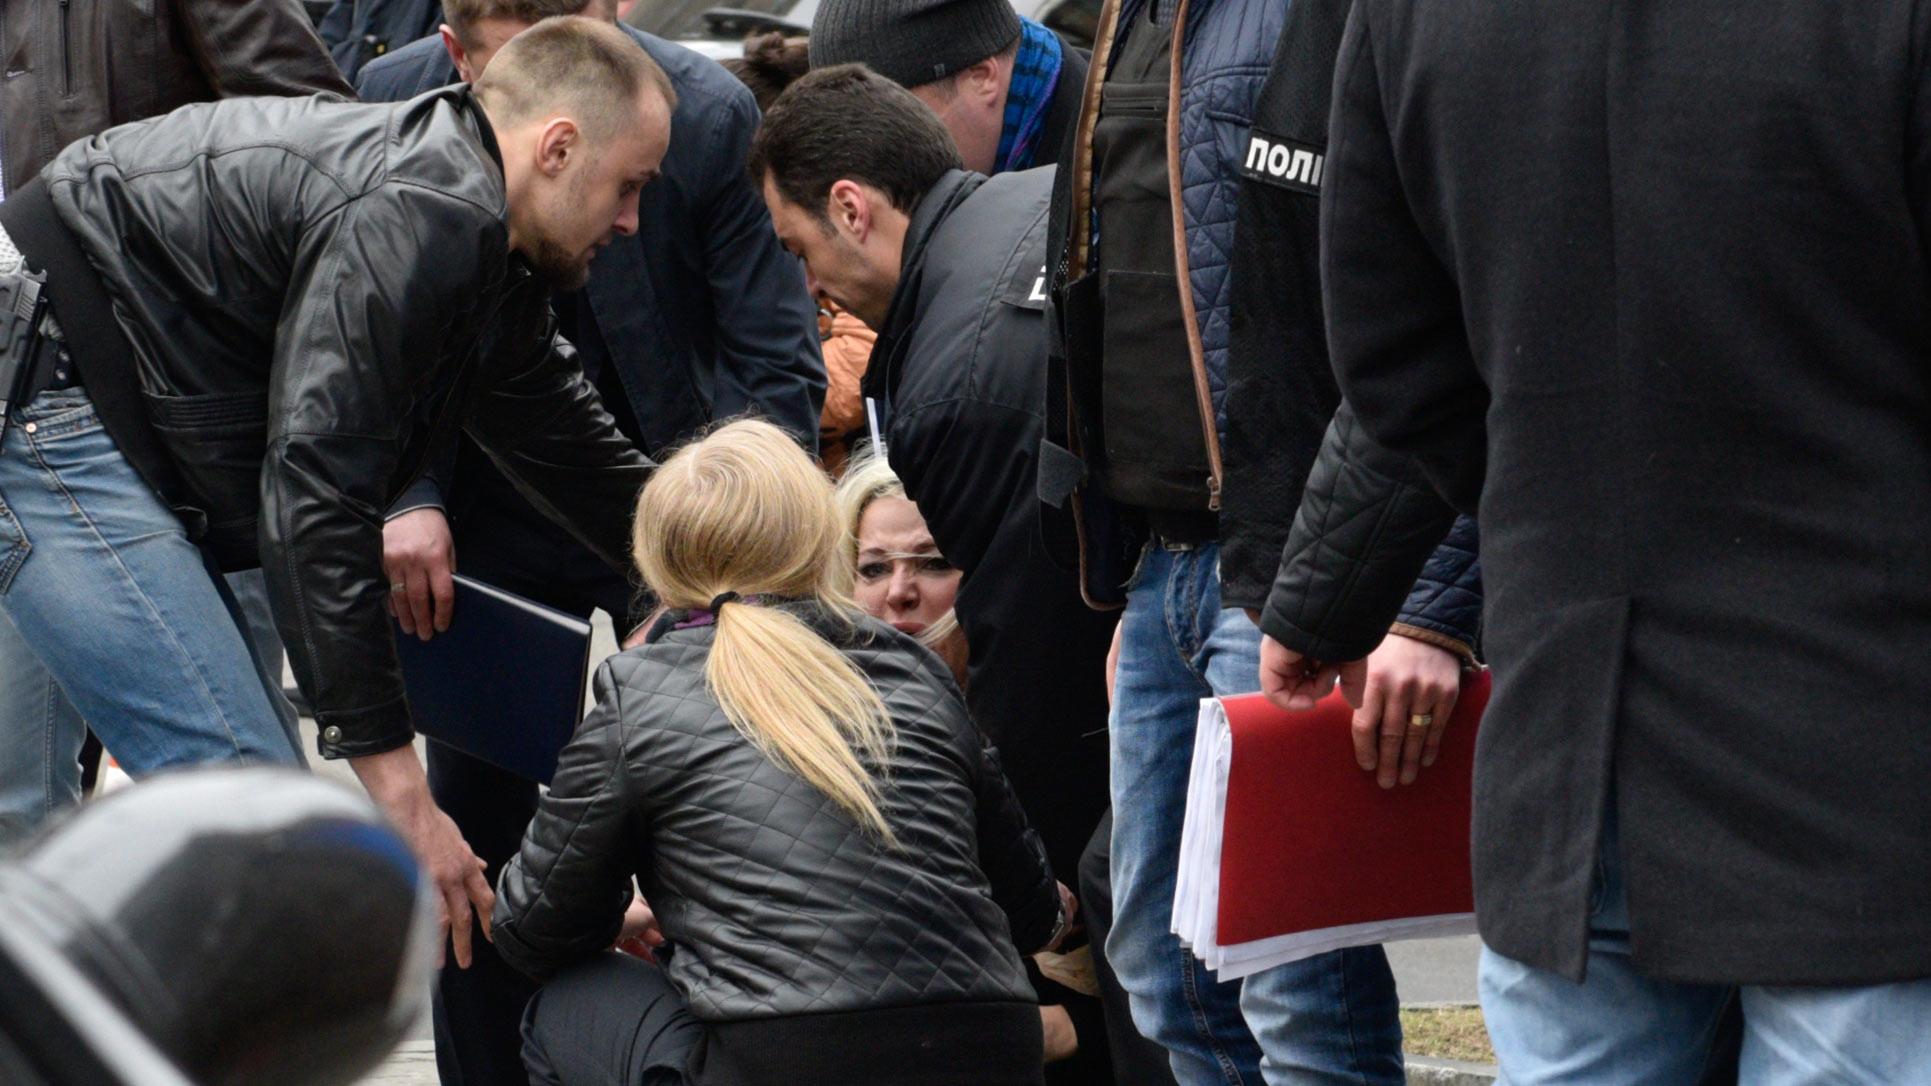 Фото: © РИА Новости / Стрингер